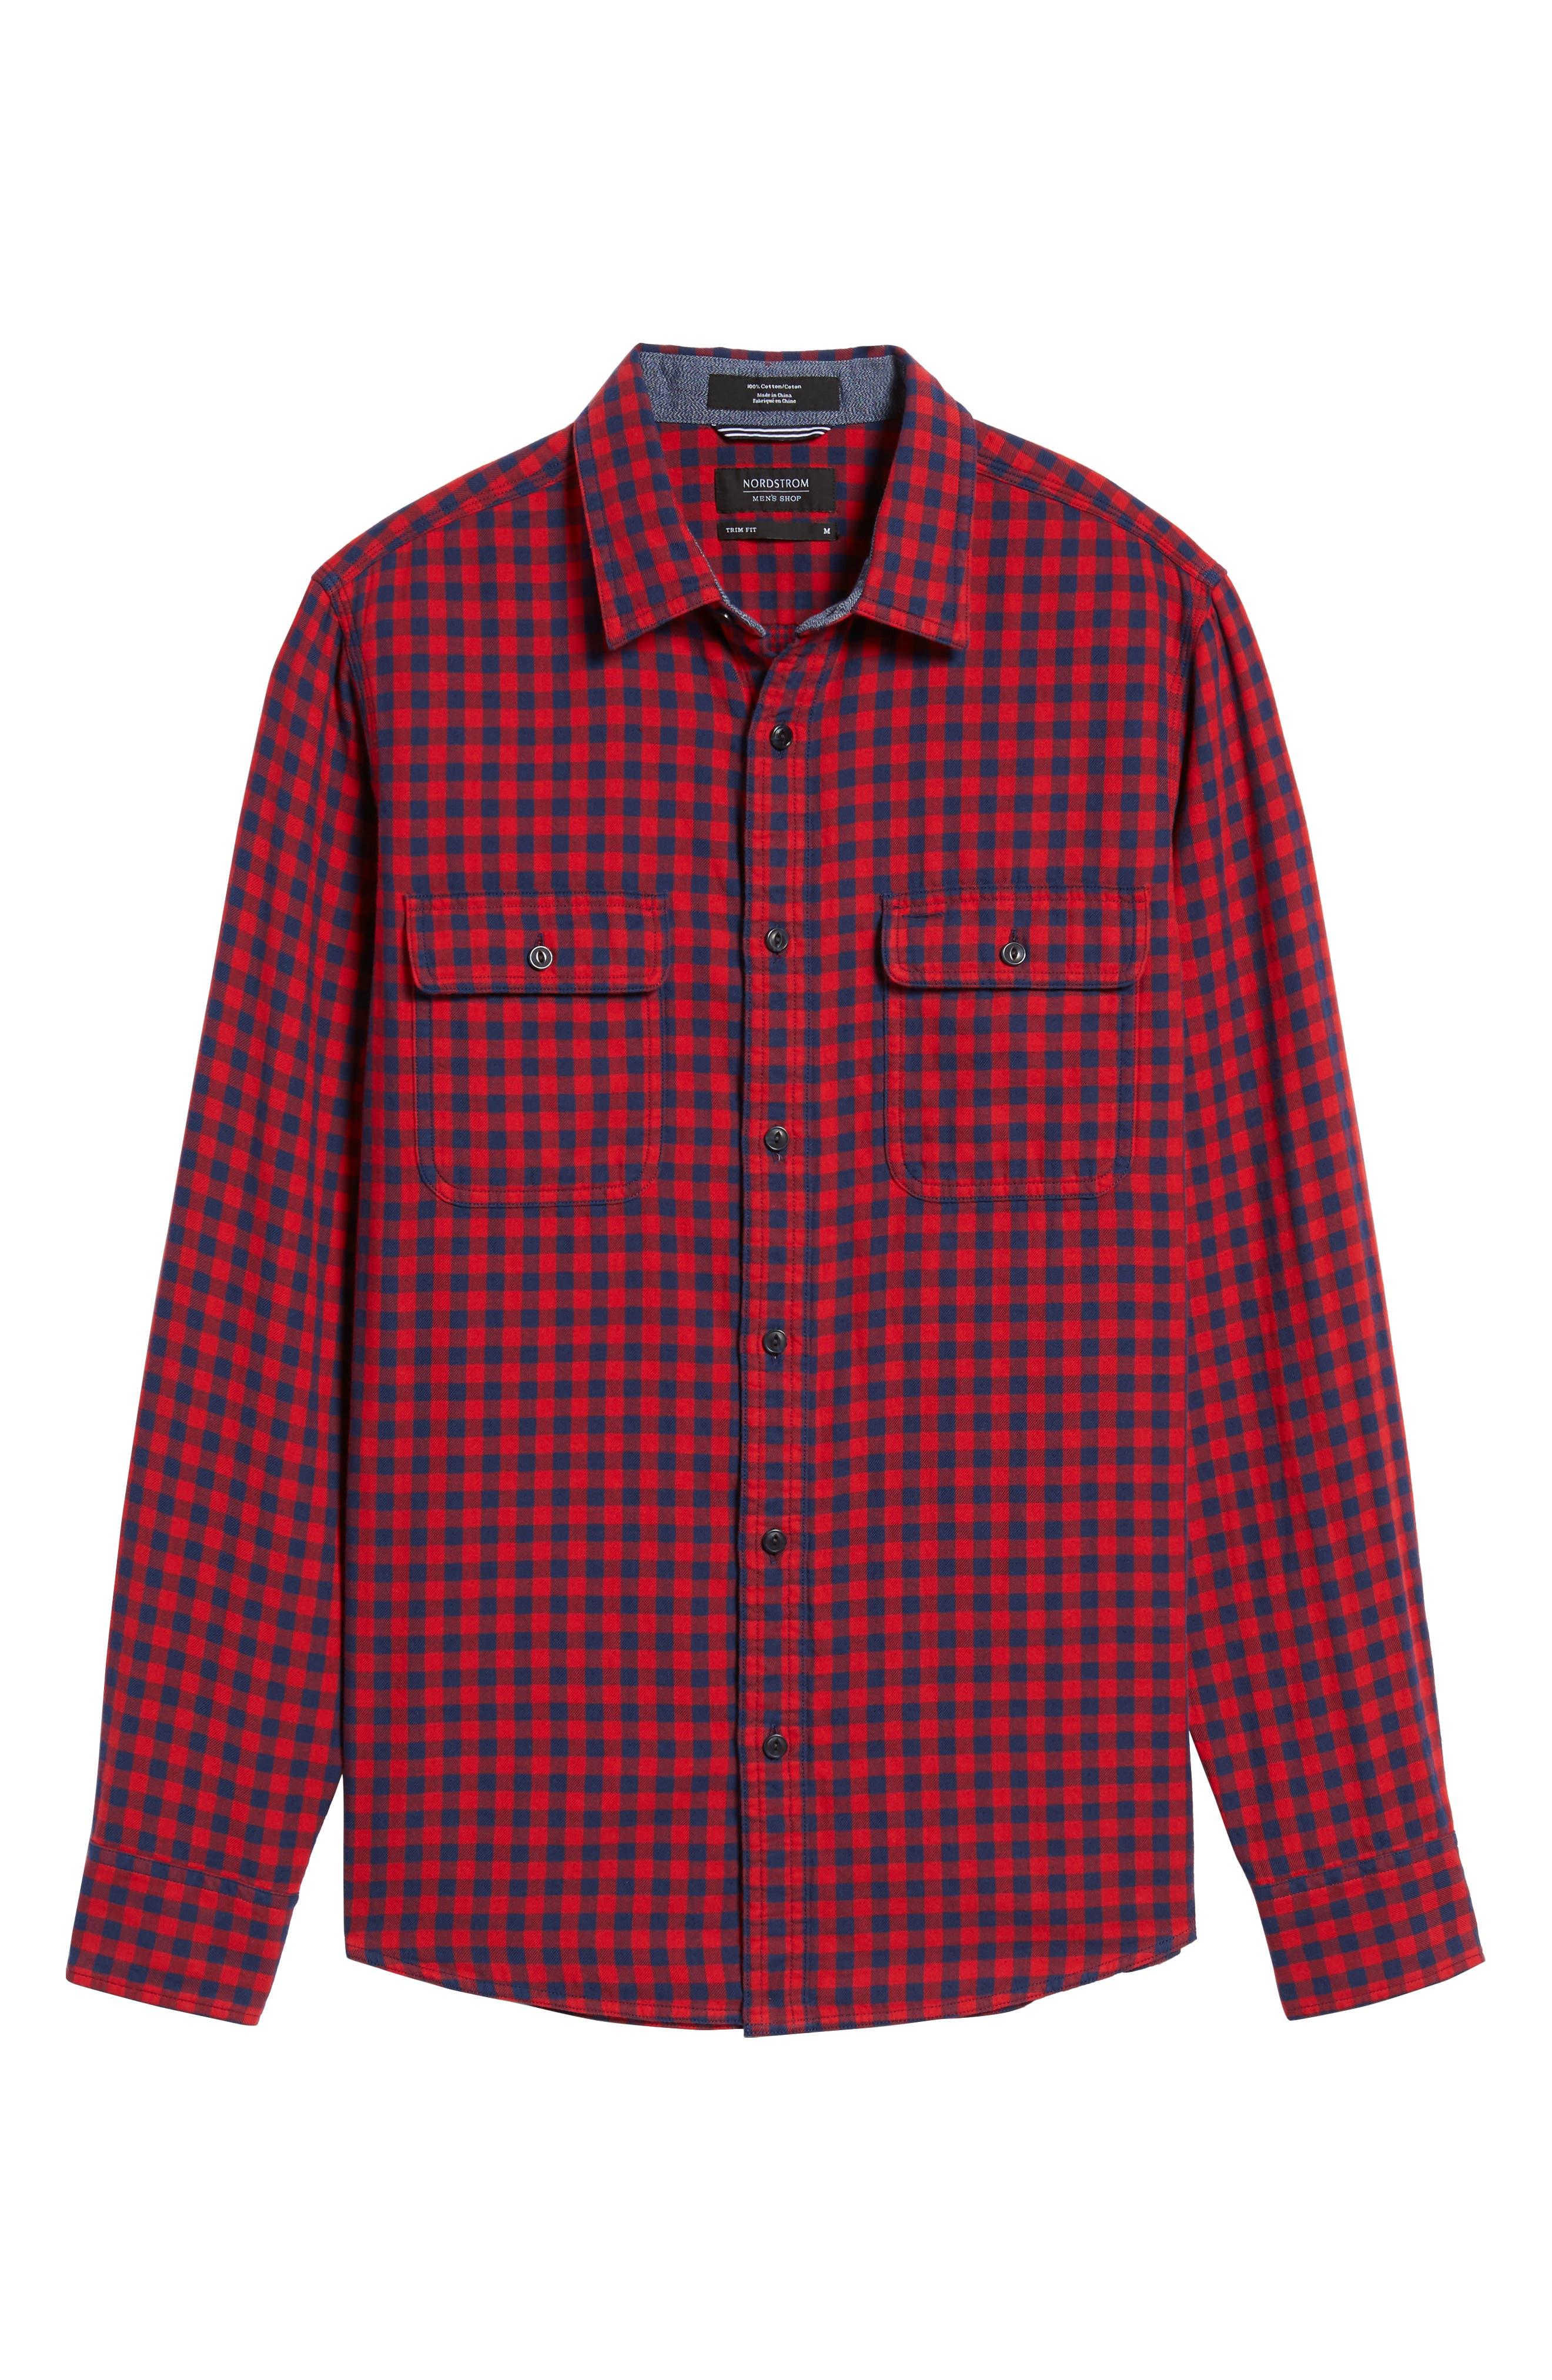 Buffalo Check Trim Fit Sport Shirt,                             Alternate thumbnail 6, color,                             610